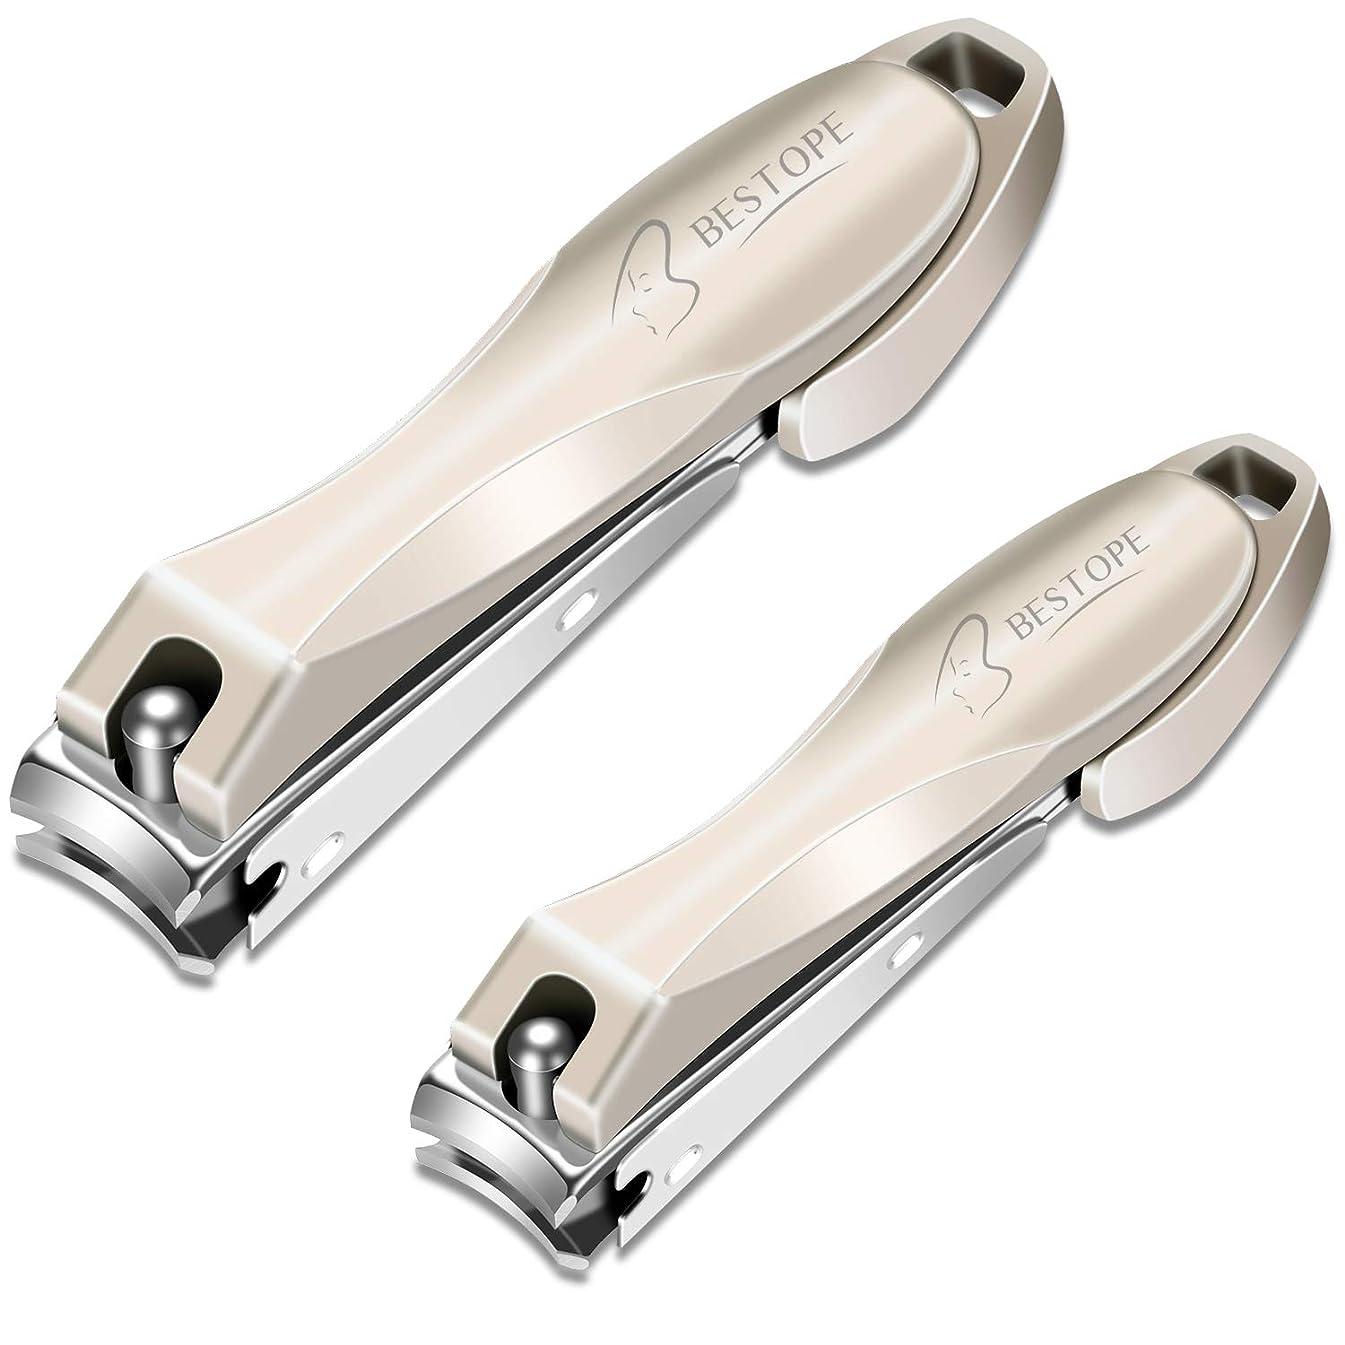 BESTOPE 【令和モデル】 爪切り つめきり カバー付き ステンレス鋼製 飛び散り防止 収納ケース付き 手足用 2本セット